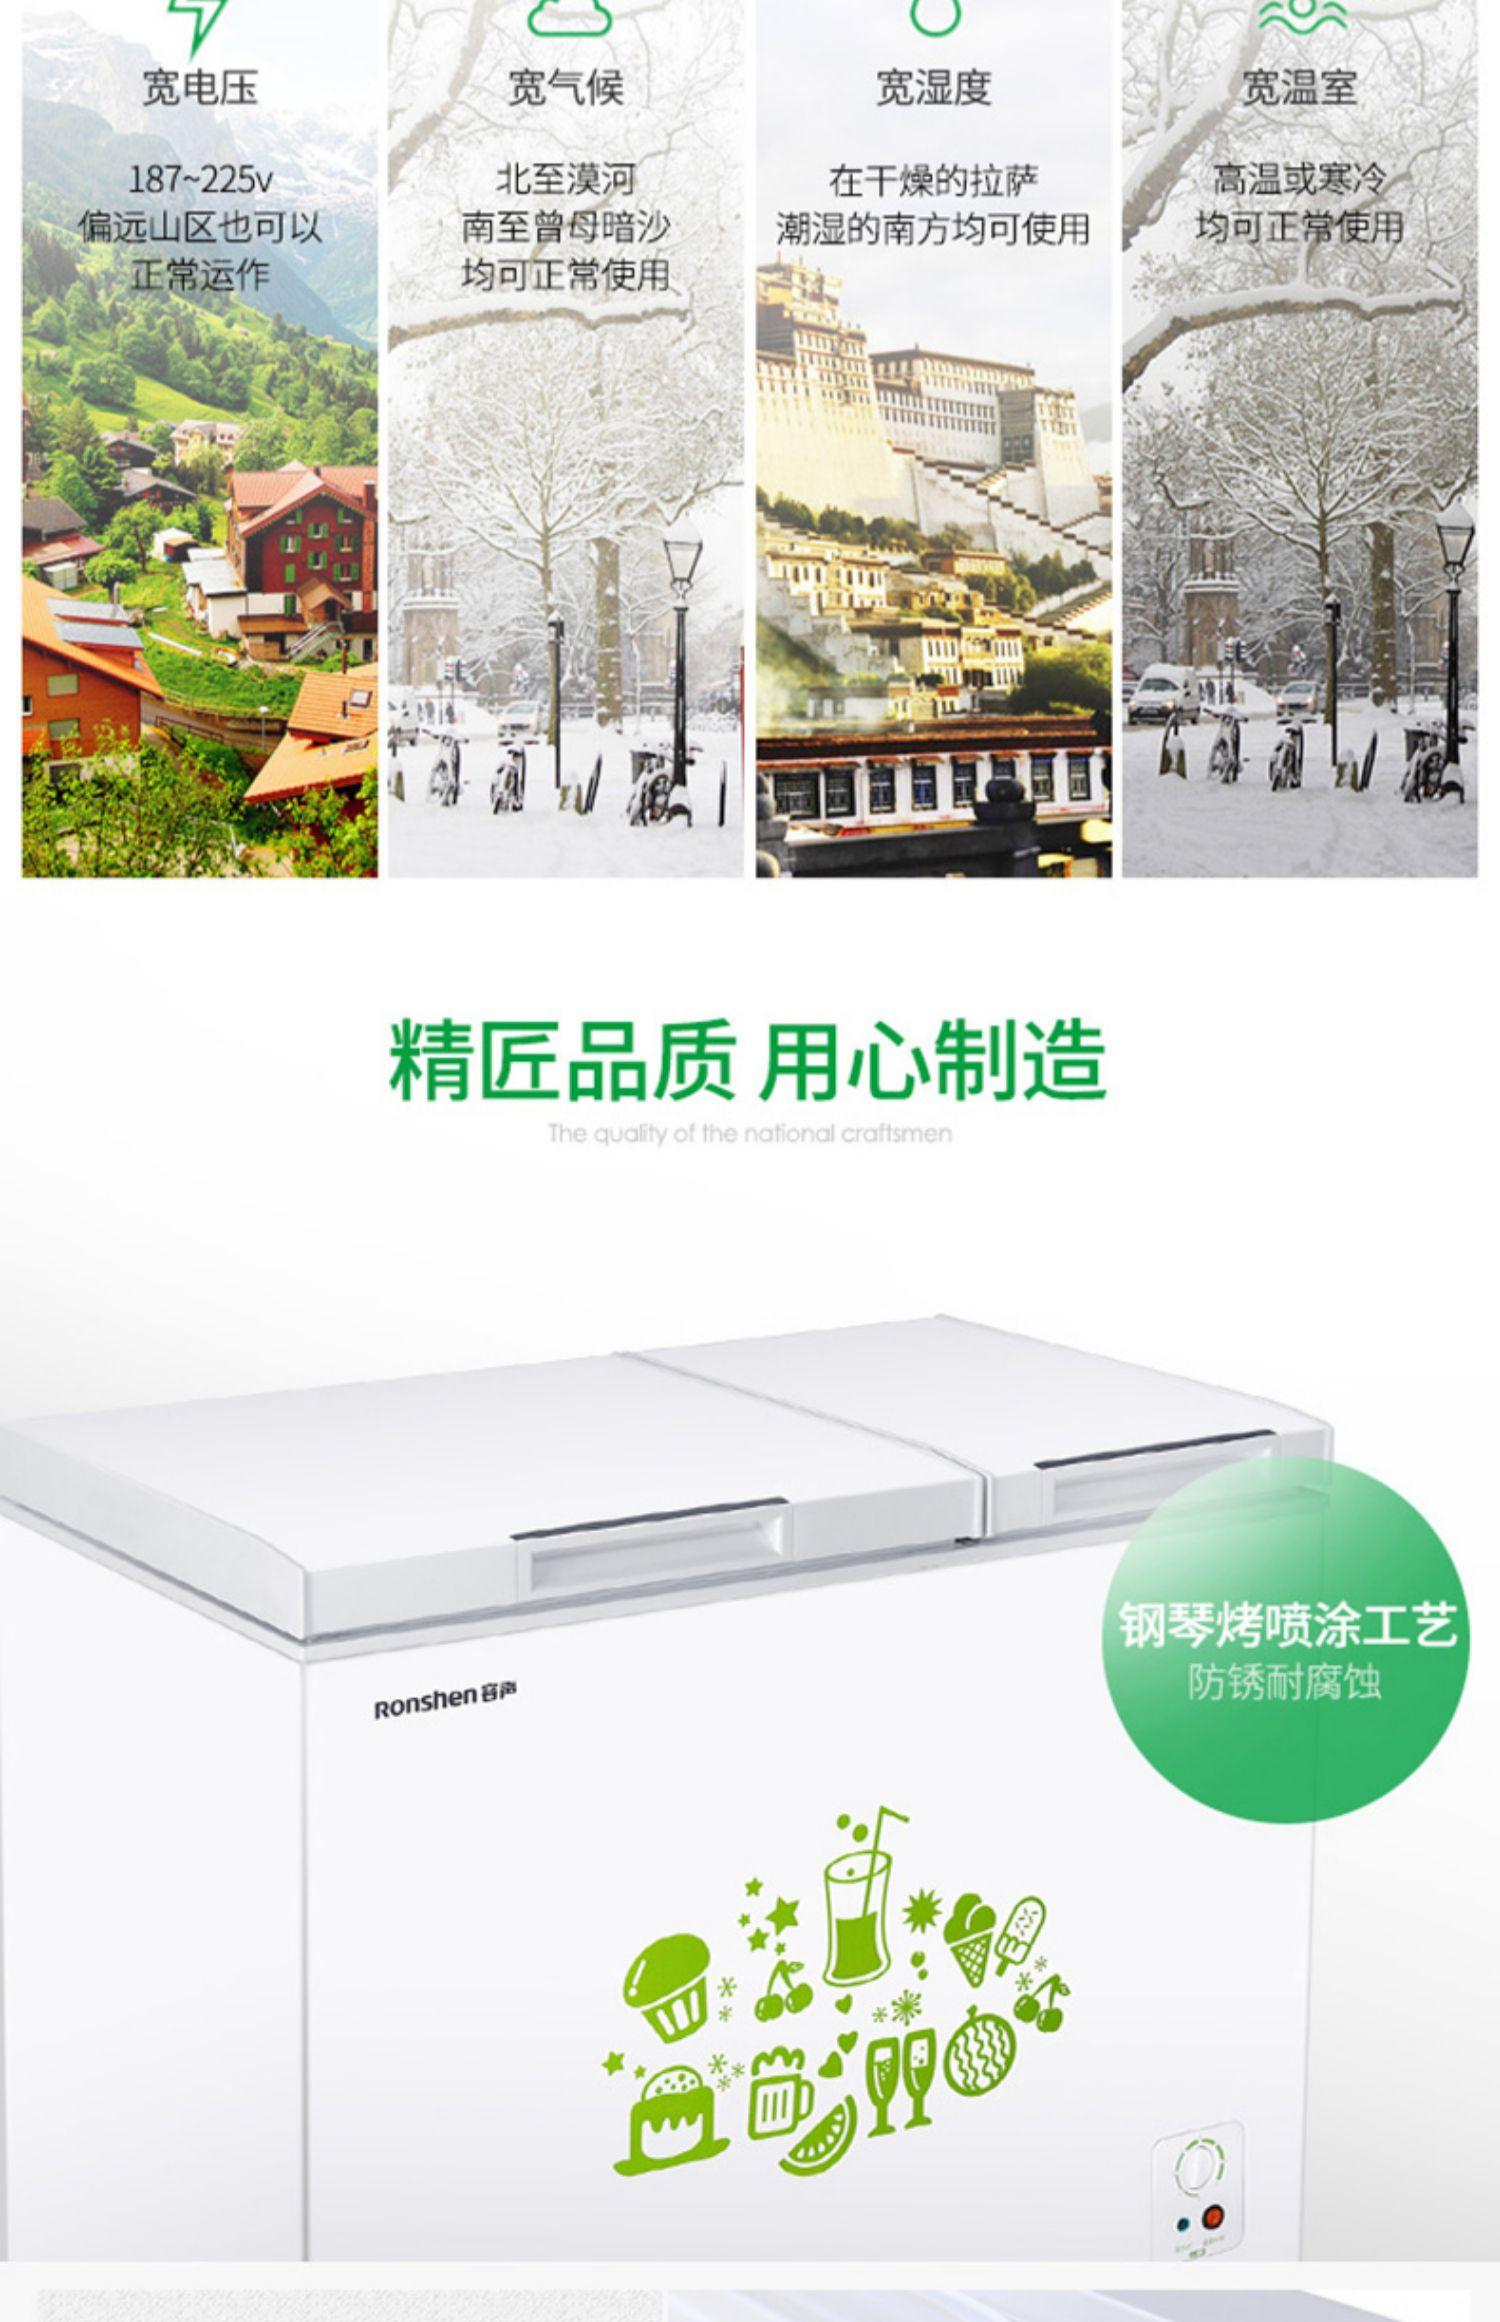 Ronshen/容声 BCD-208MS/A顶开门冷冻冷藏双温柜冰柜家用冷柜冰柜商品详情图